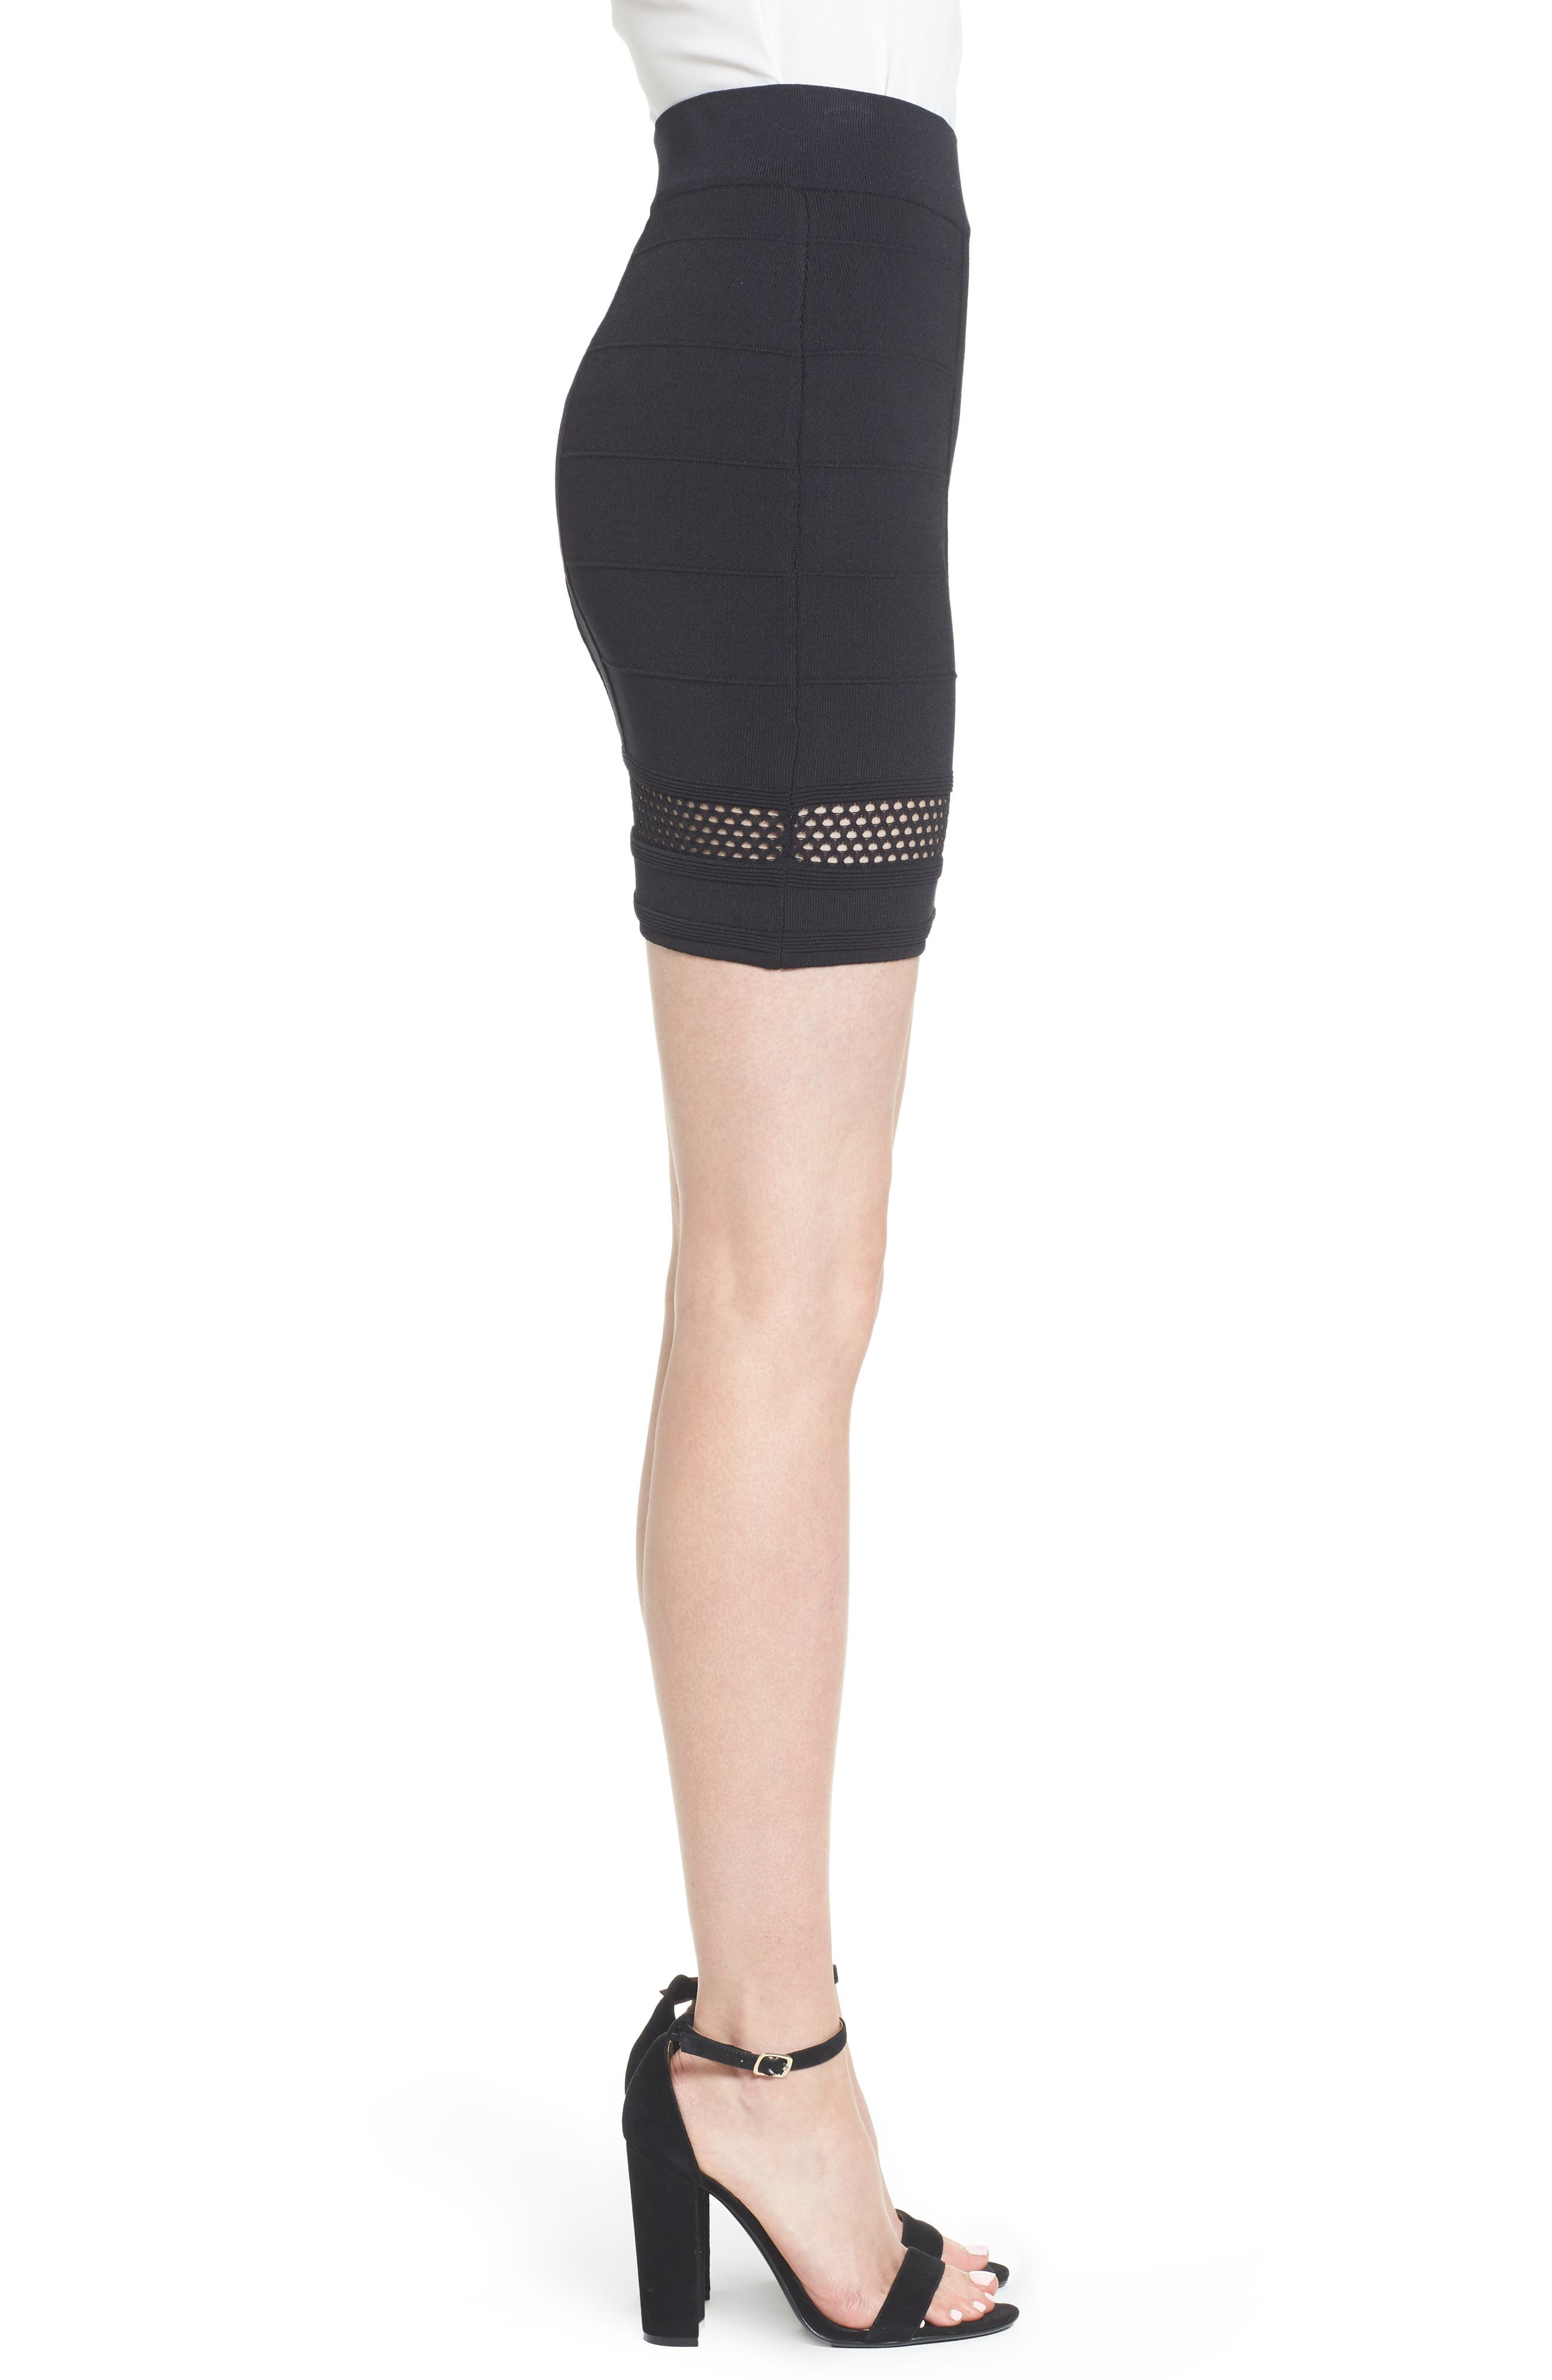 Bishop + Young Siena Peekaboo Skirt,                             Alternate thumbnail 3, color,                             Black